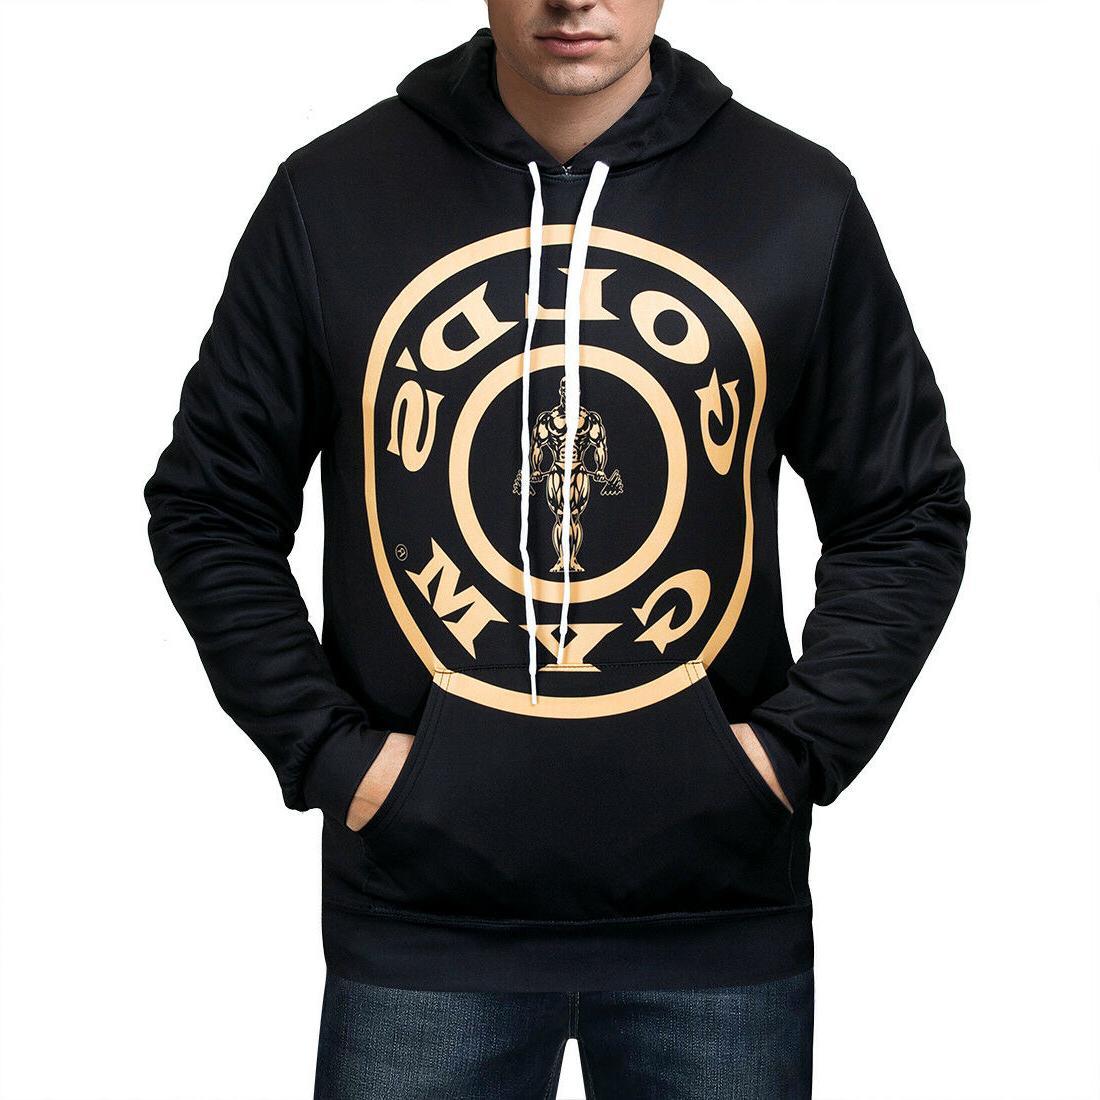 Women/Men Sweater Jacket Pullover